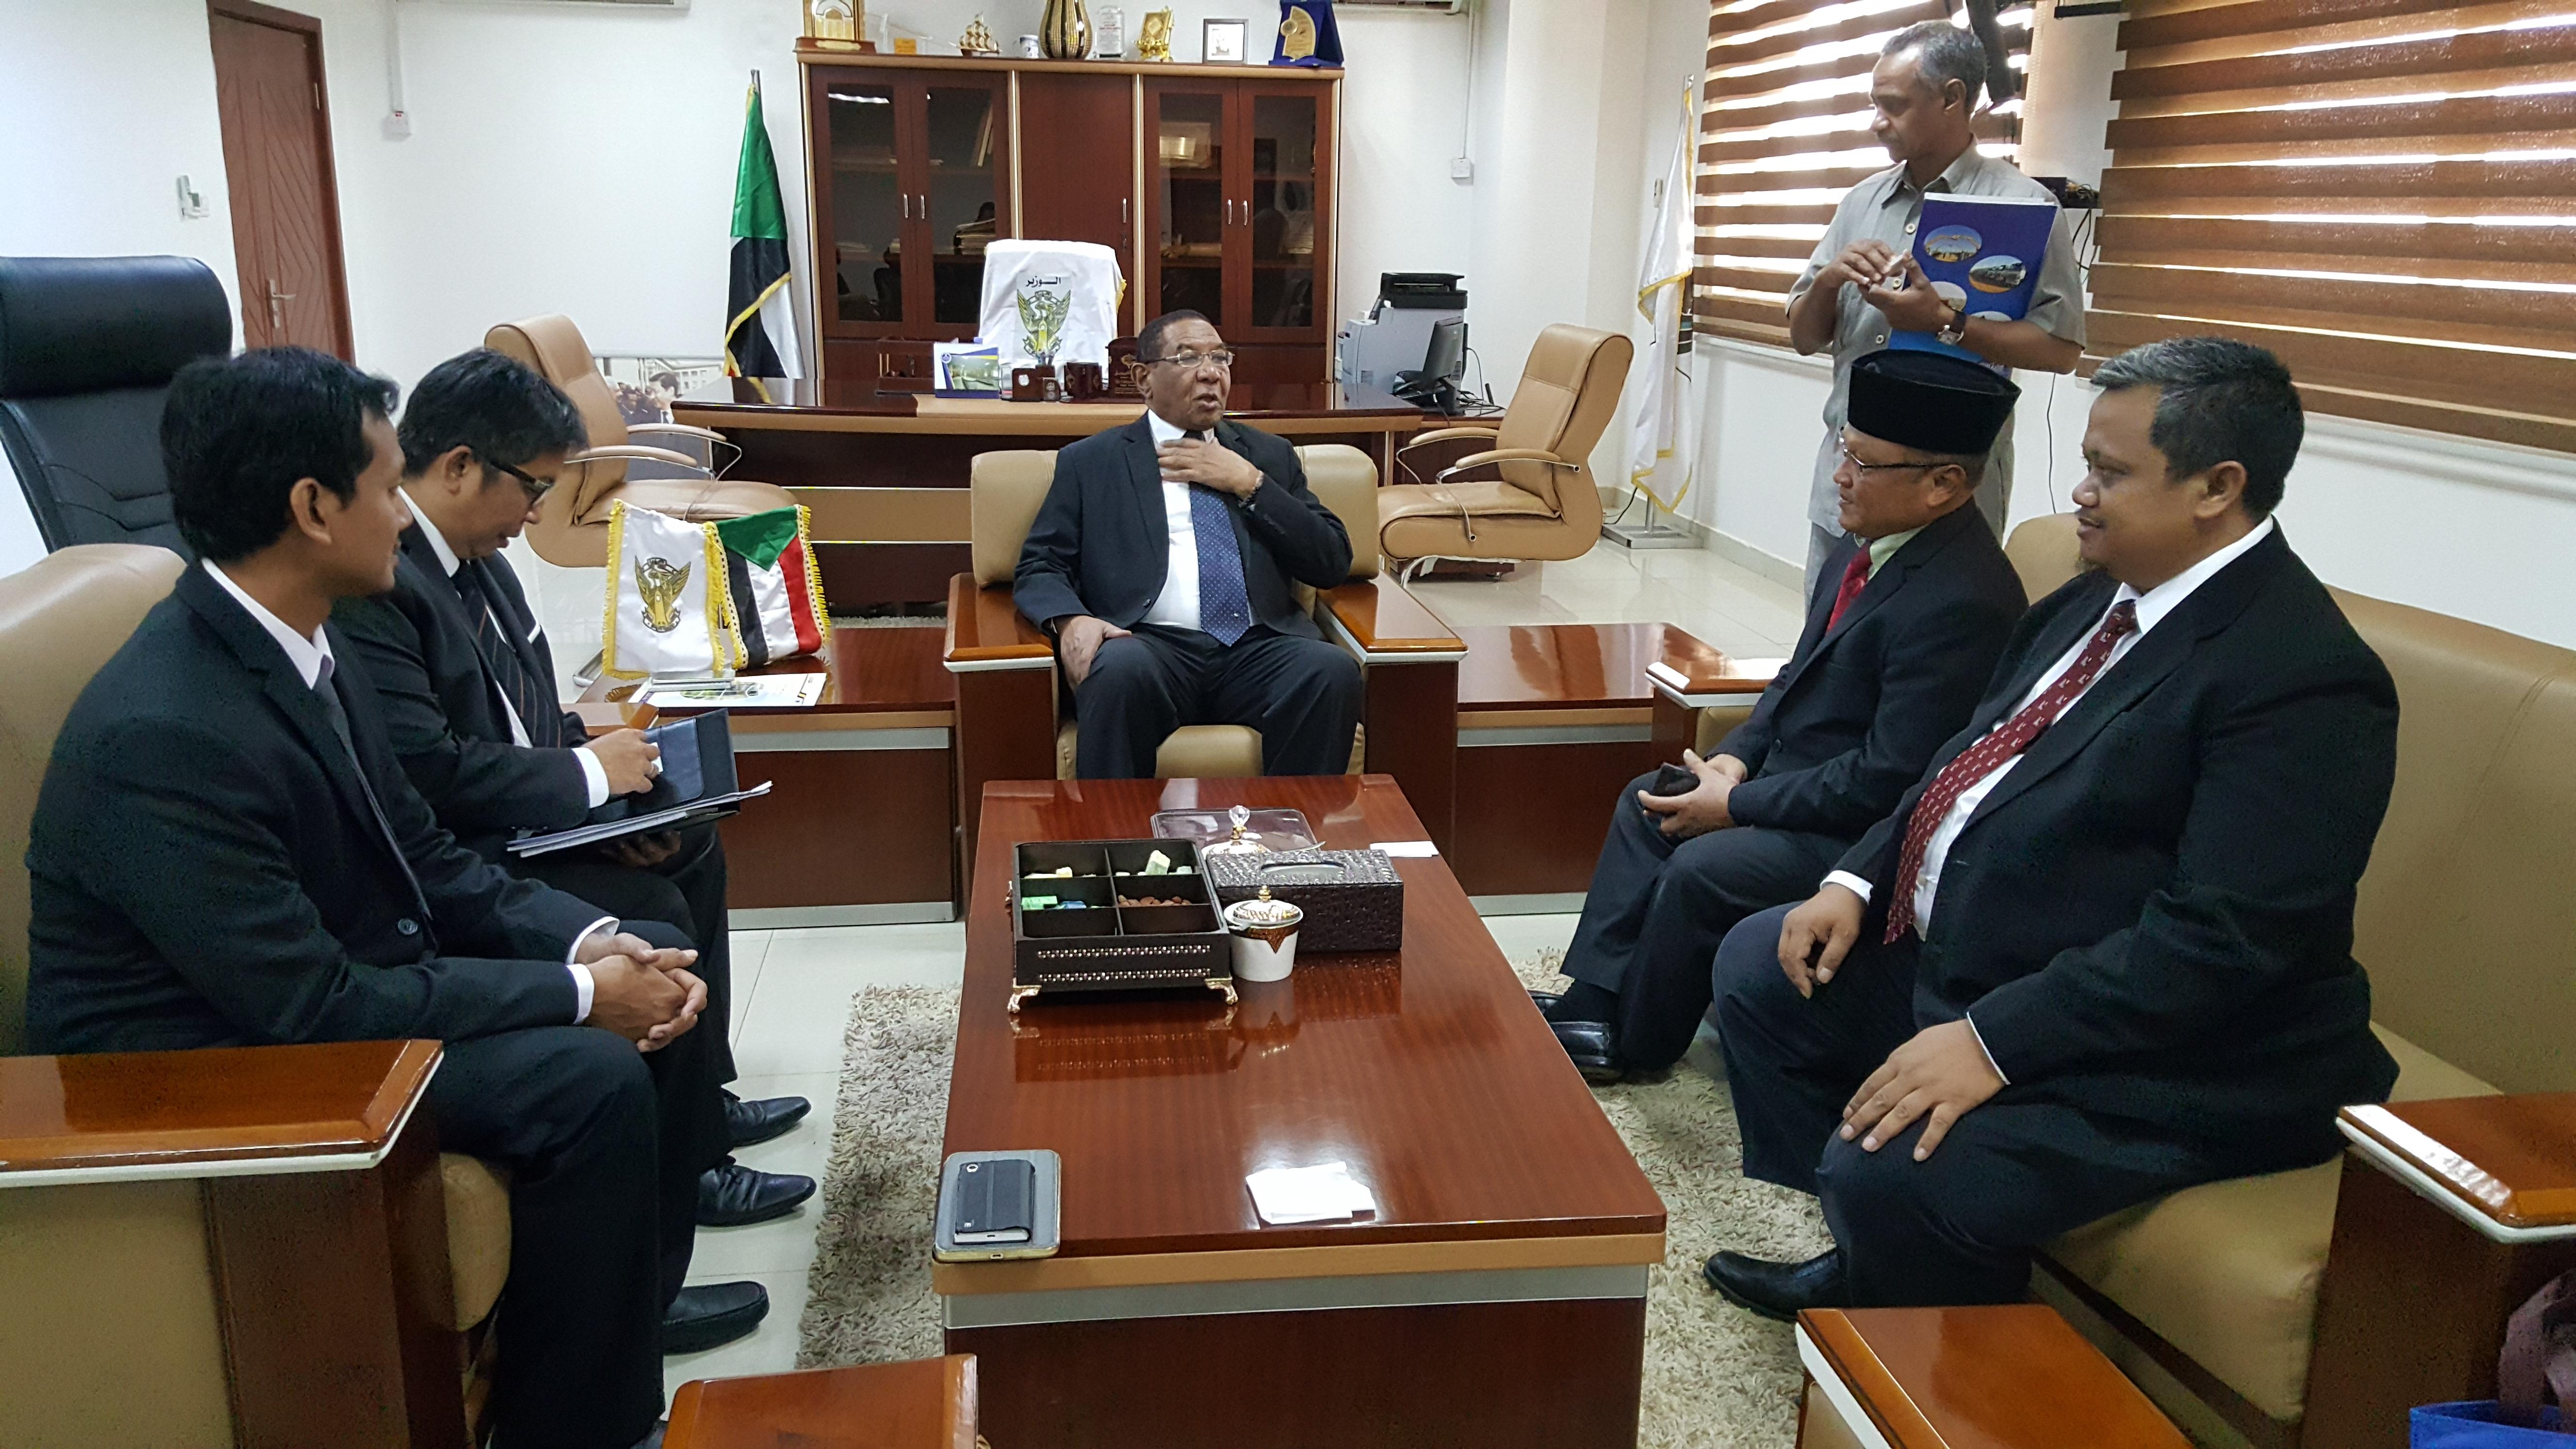 Dubes RI untuk Republik Sudan mewakili PT INKA membahas kerja sama investasi kereta api Indonesia untuk Sudan (foto: KBRI Khartoum)